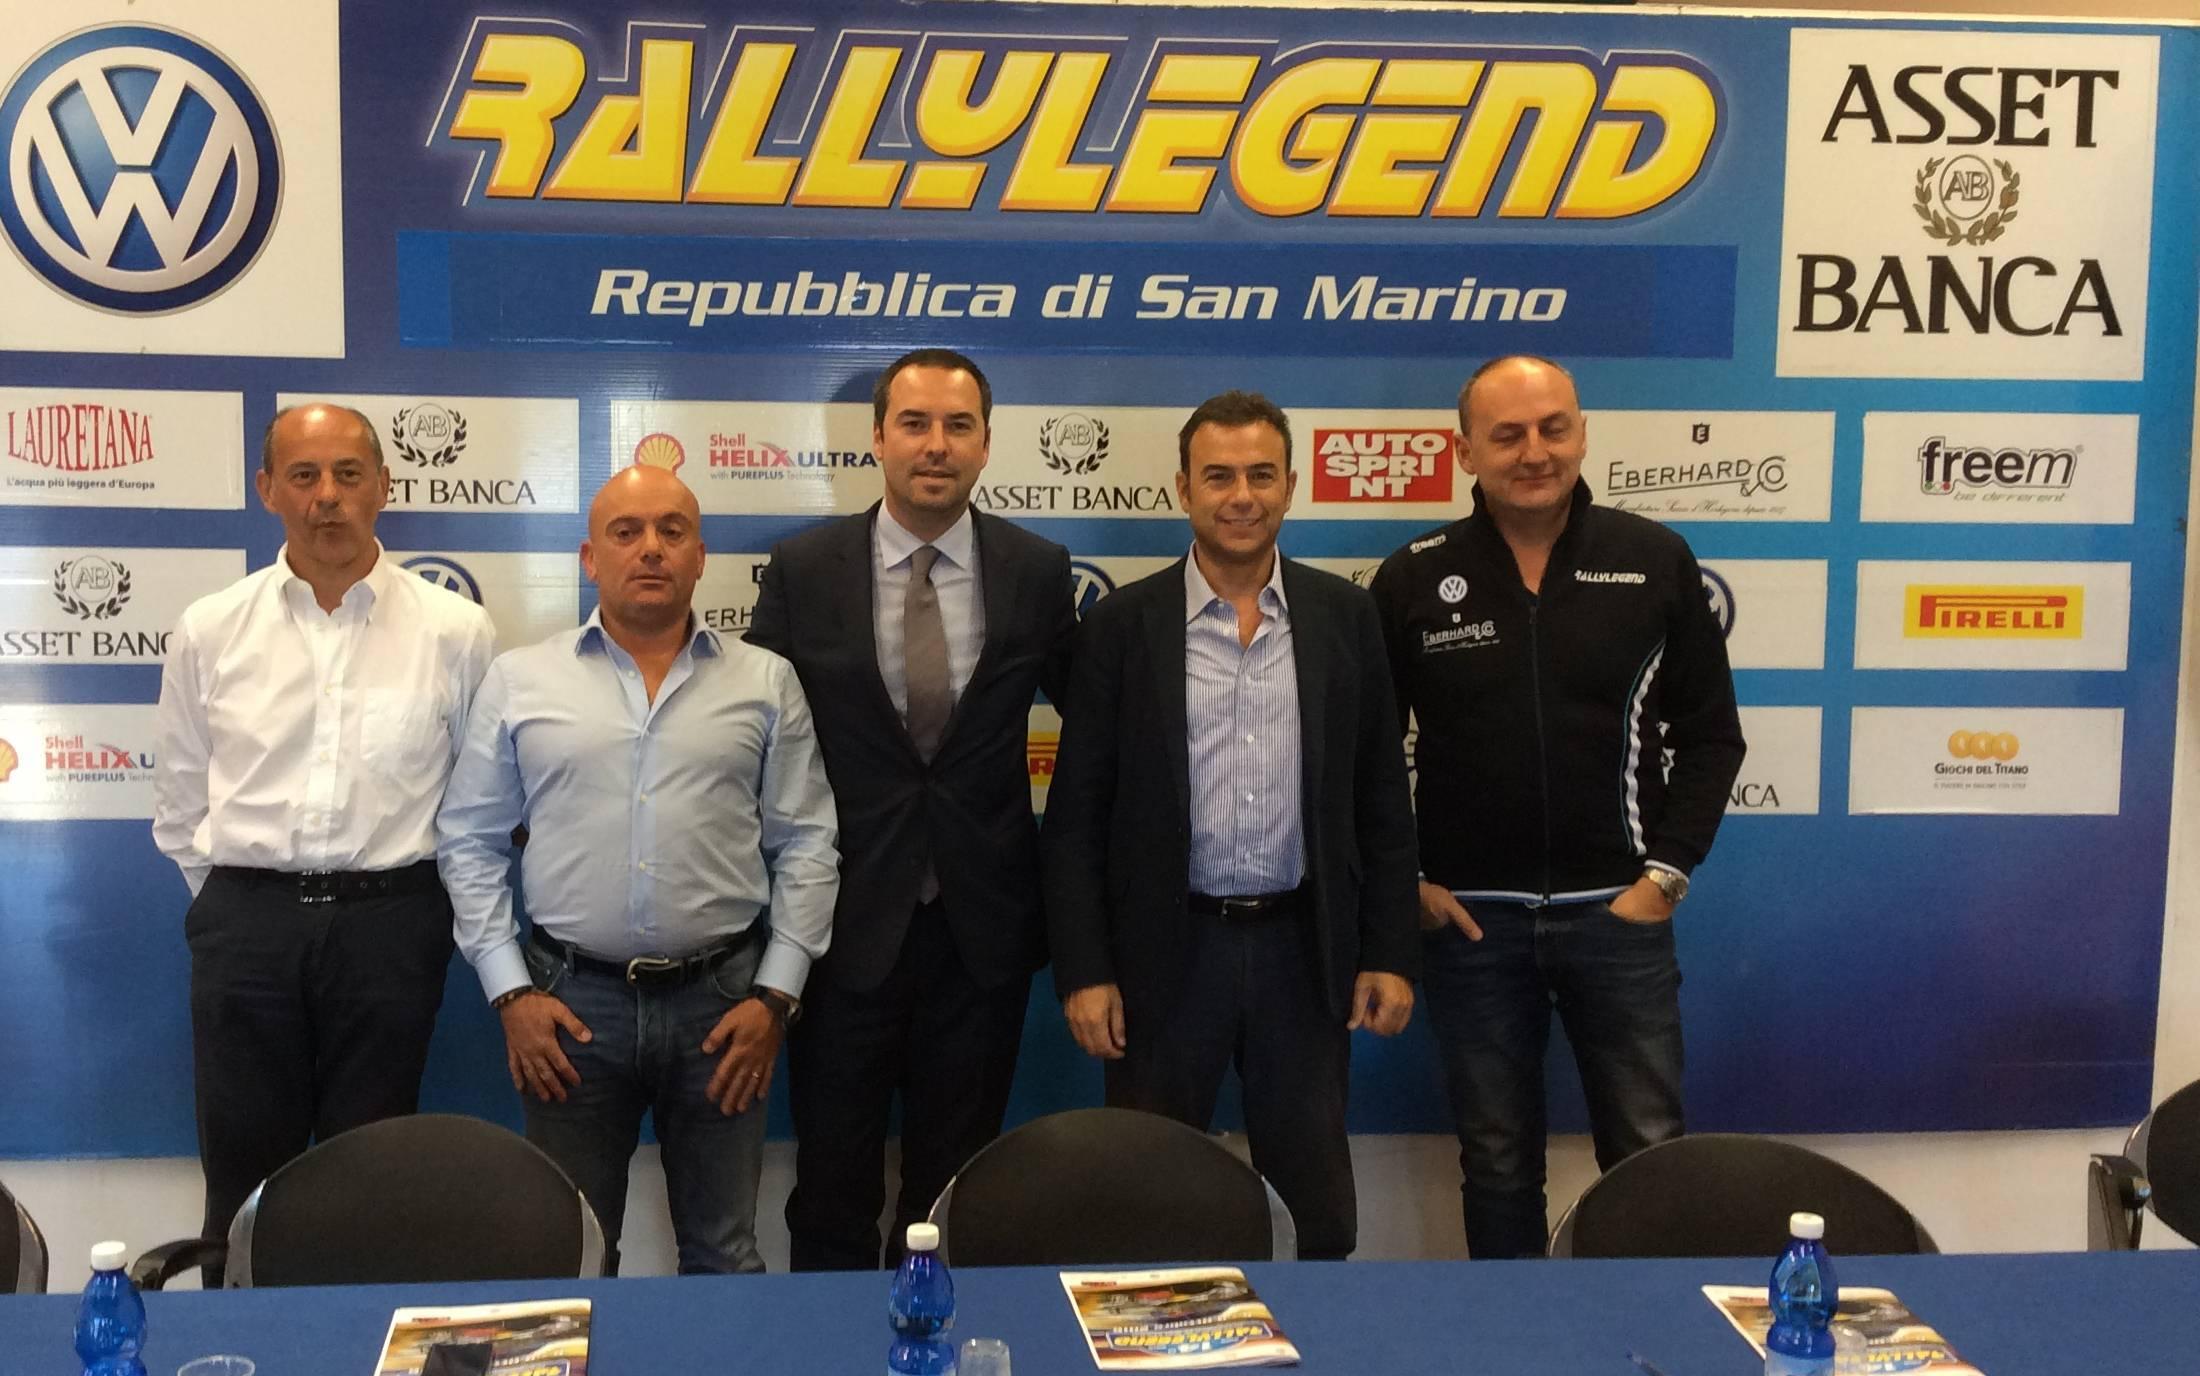 Presentata la 14a edizione di Rallylegend